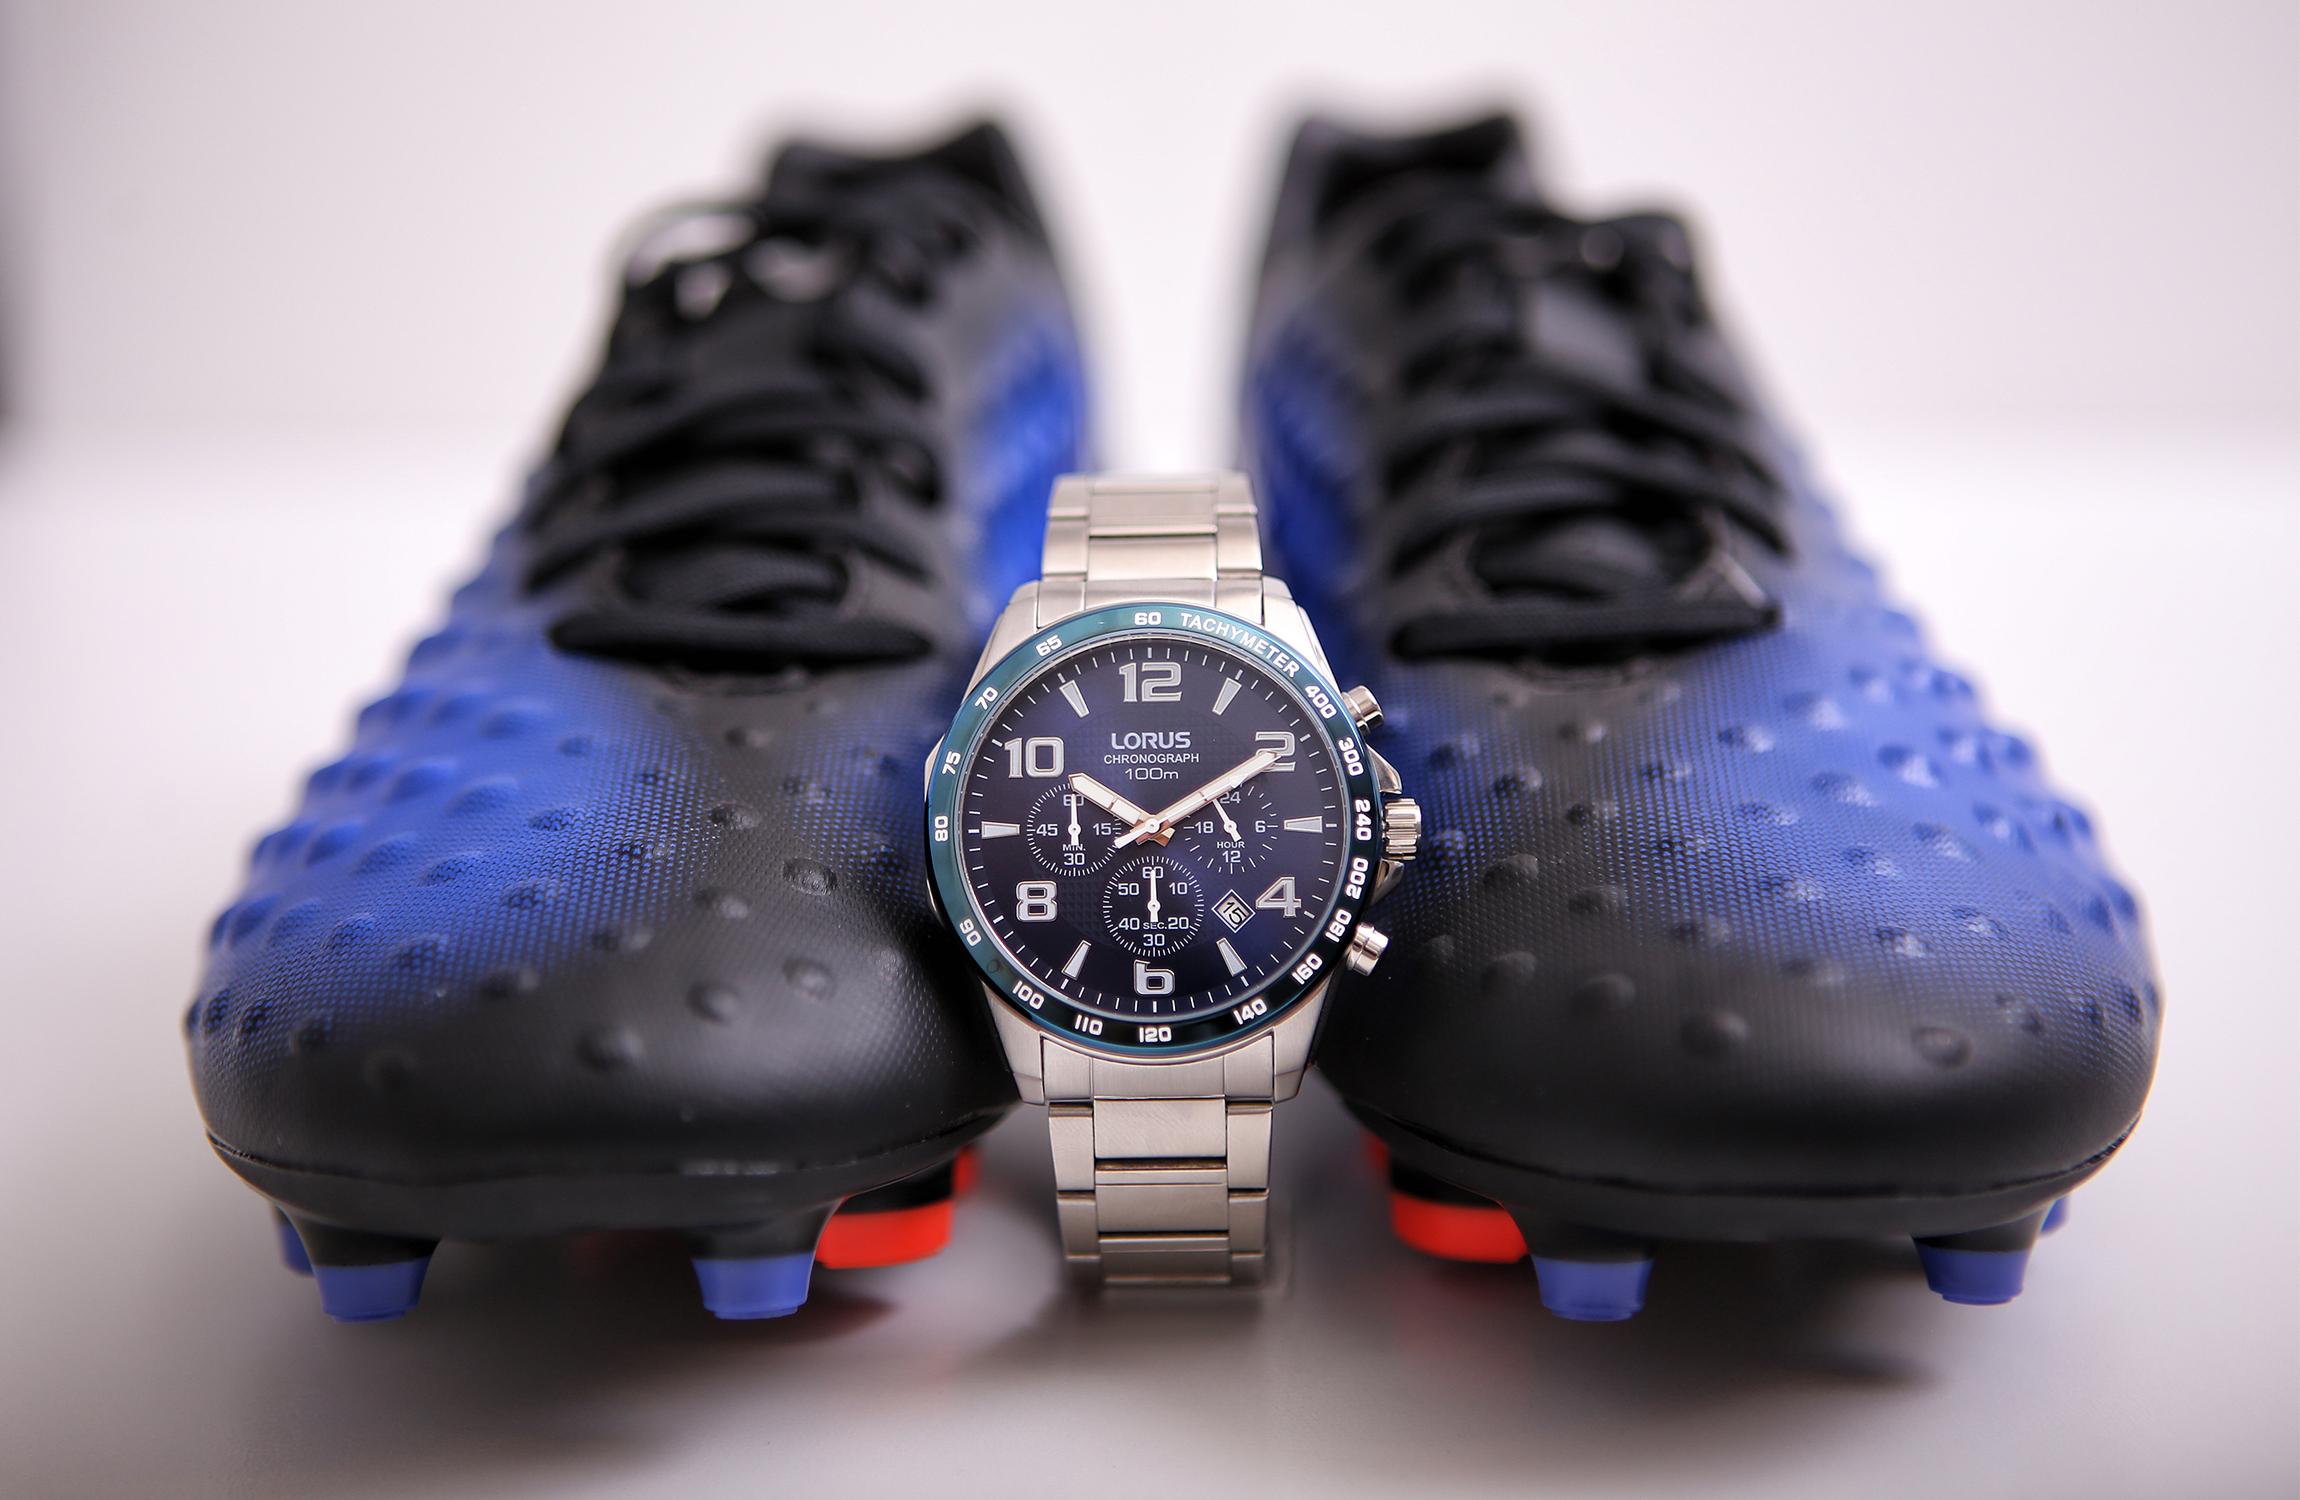 Zegarek męski Lorus sportowe RT353CX9 - duże 7